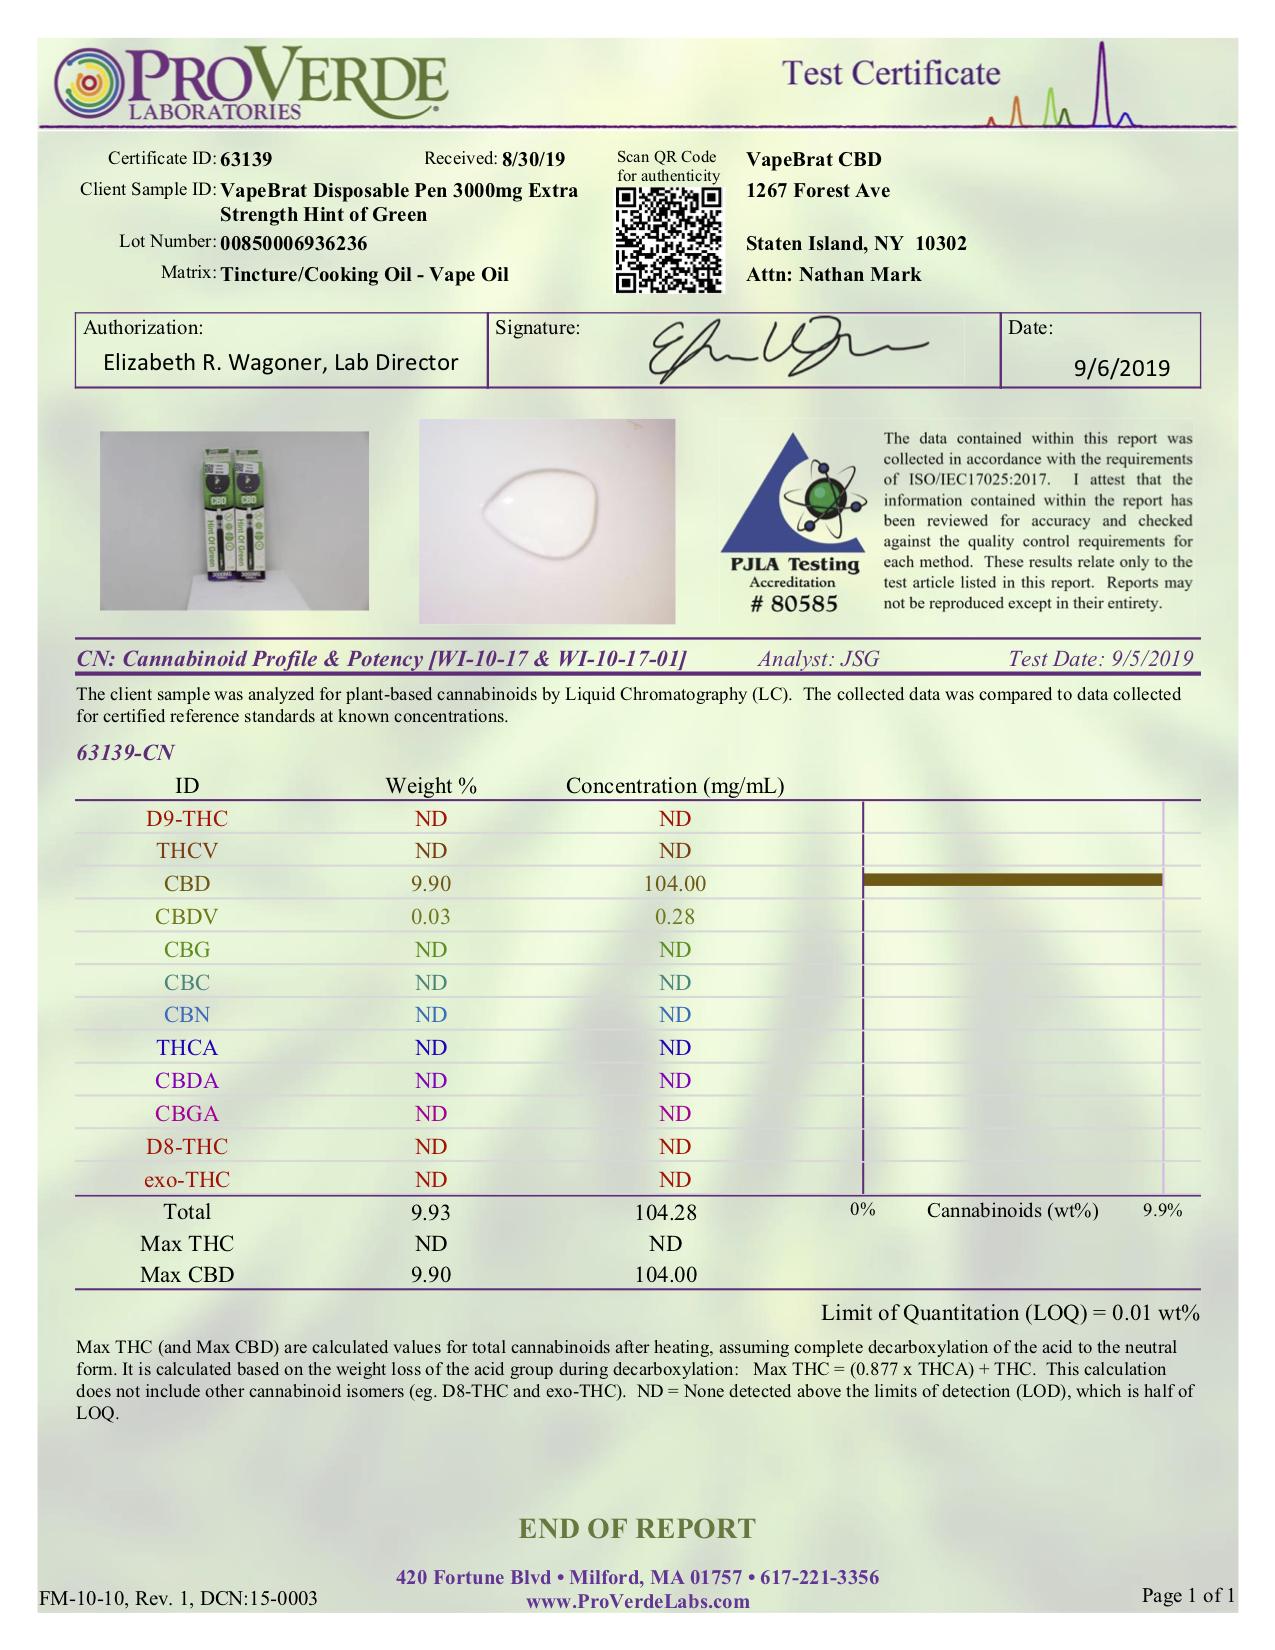 63139-vapebrat-disposable-pen-3000mg-extra-strength-hint-of-green.jpg